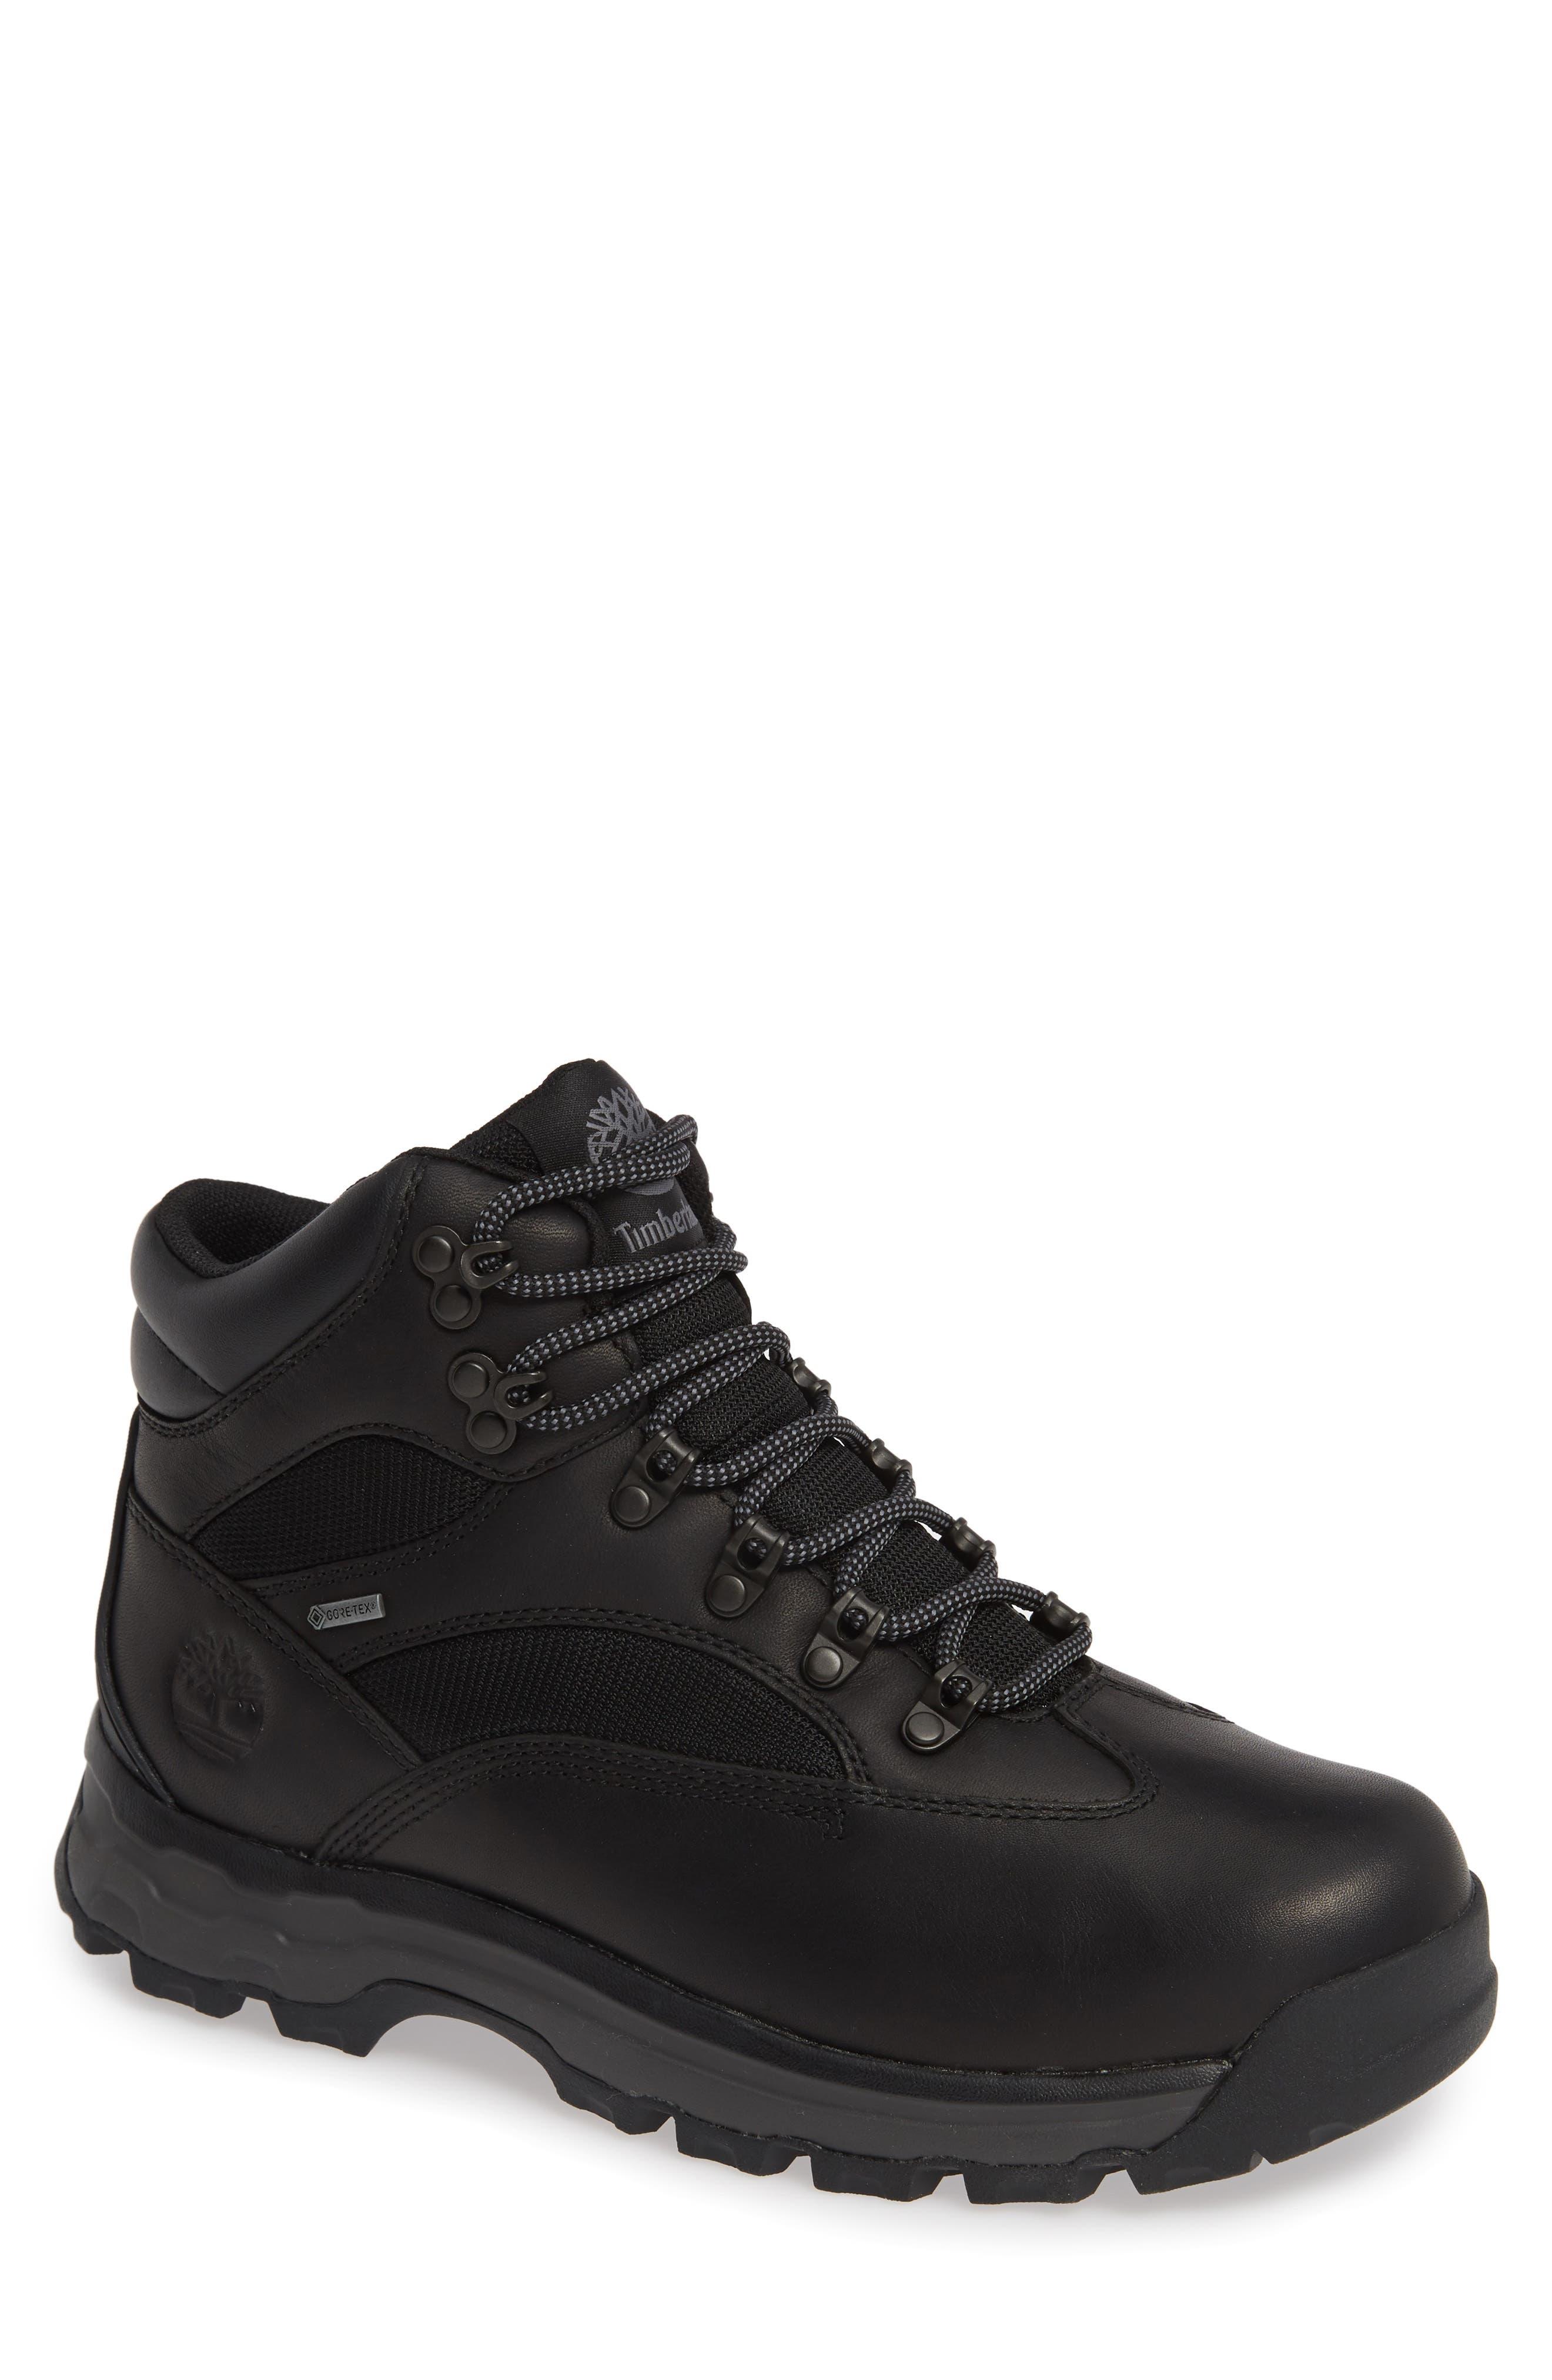 TIMBERLAND Chocorua Trail Gore-Tex<sup>®</sup> Waterproof Hiking Boot, Main, color, BLACK FULL GRAIN GORE TEX